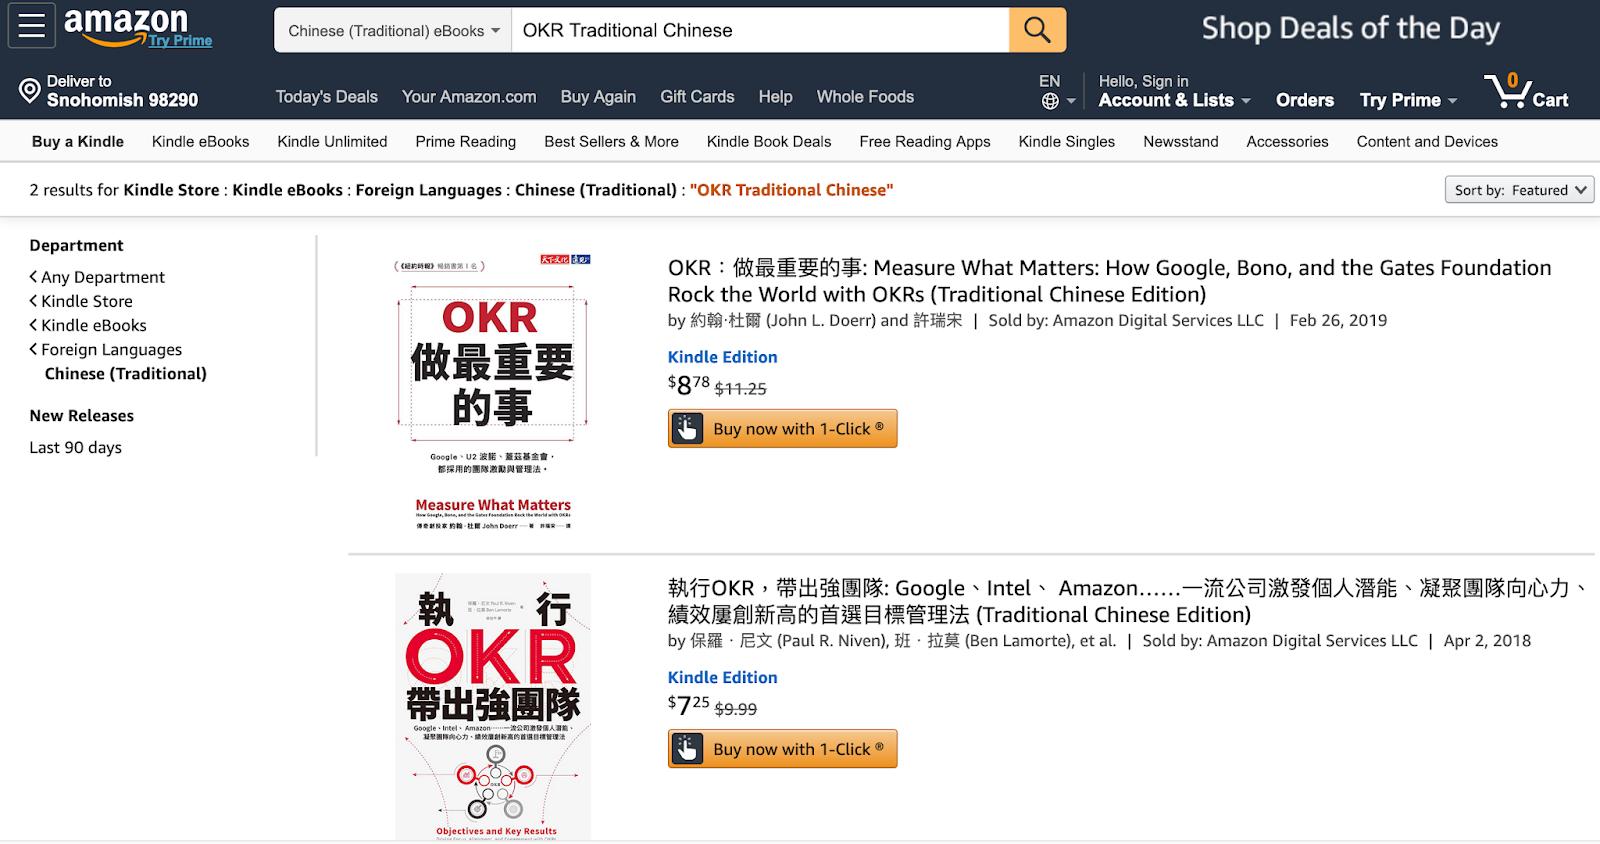 Amazon Kindle 繁體中文電子書。找書、買書、看書的圖文心得分享